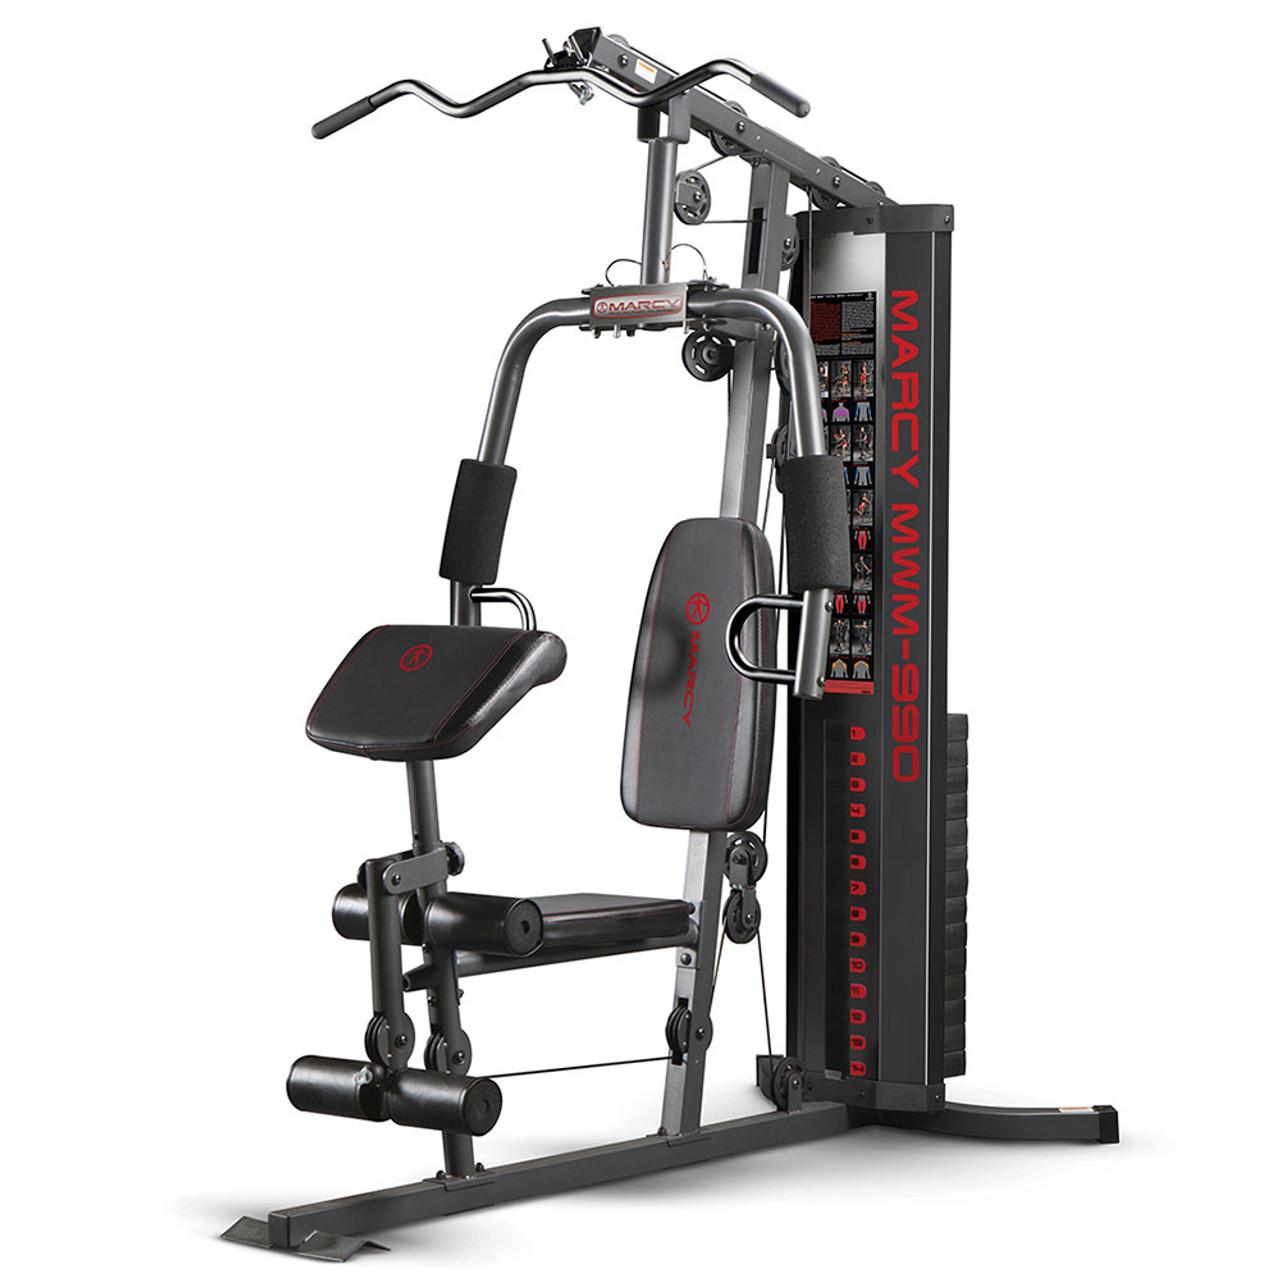 Pro power multi gym assembly instructions manual pdf